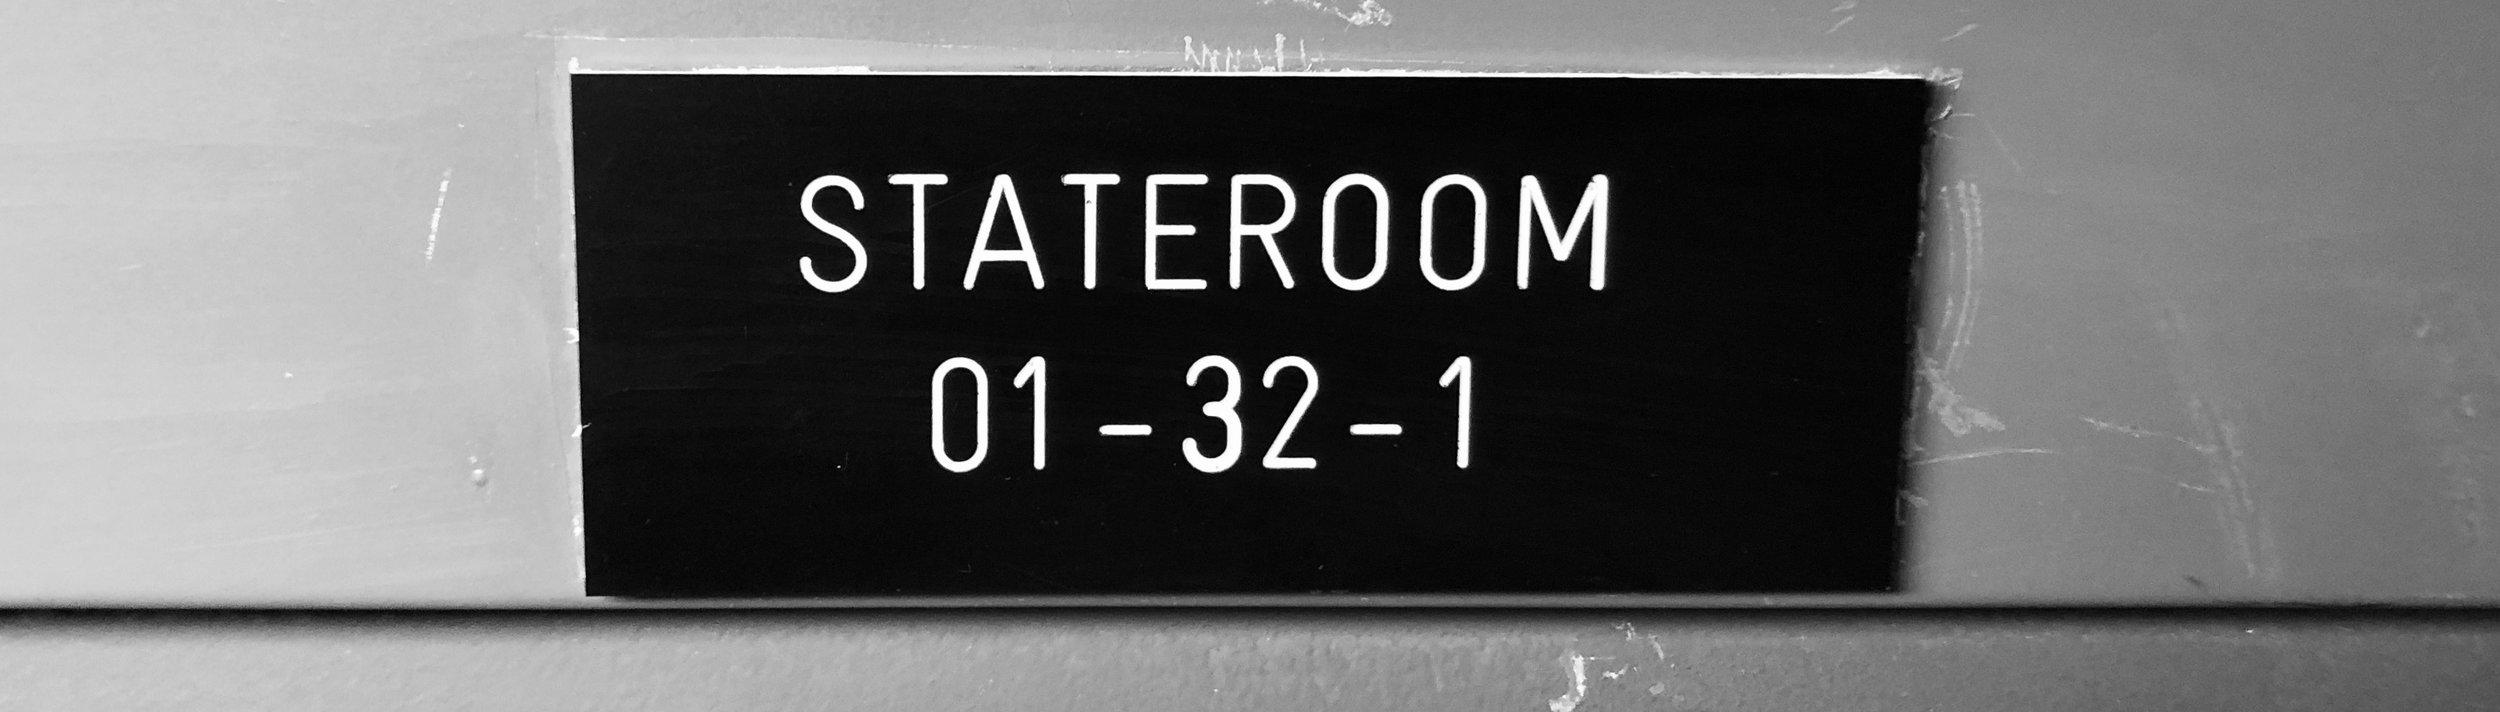 State Room.jpg